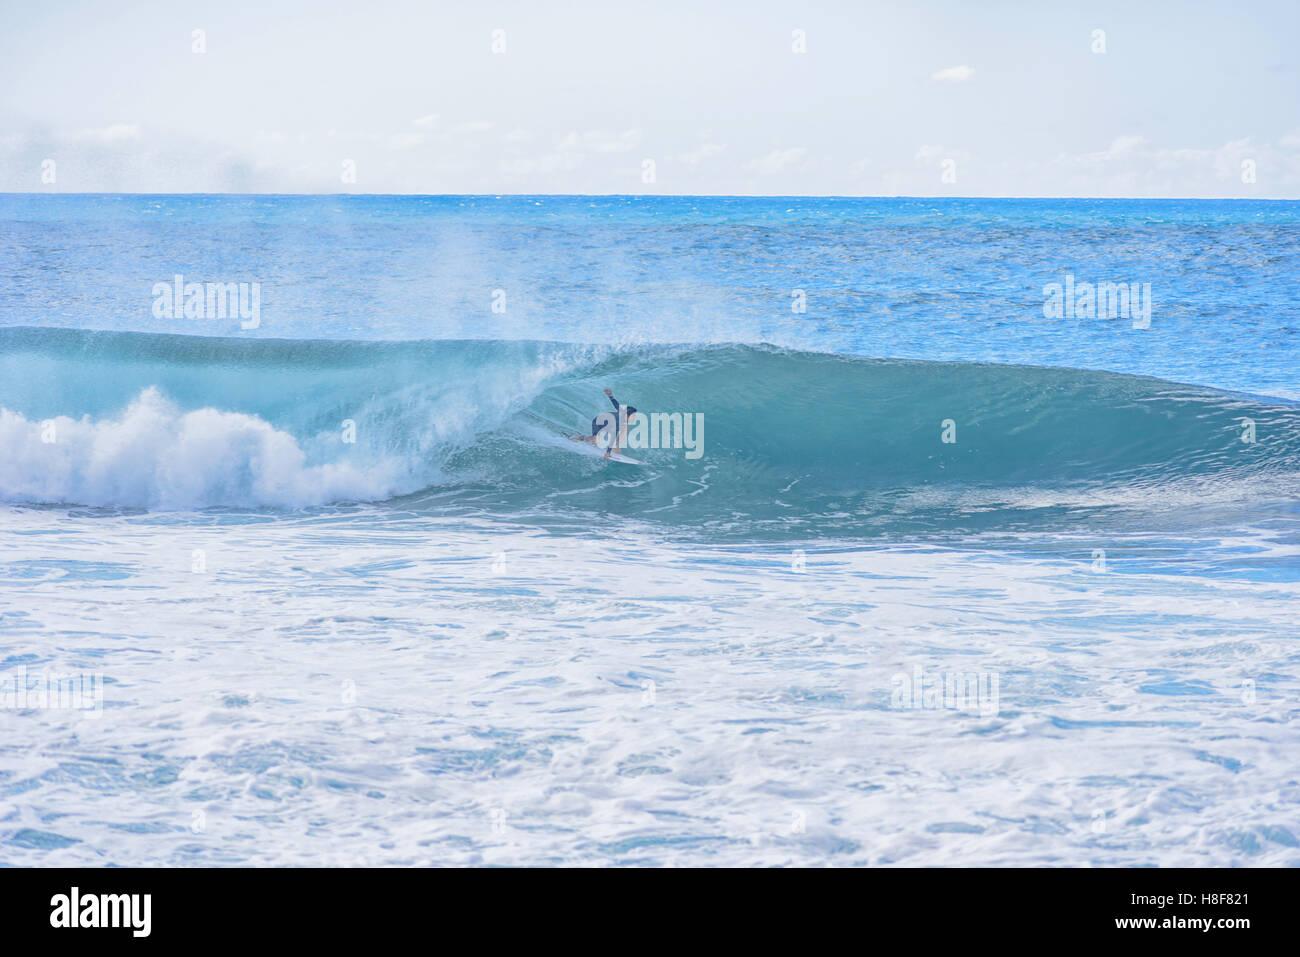 7beeaaf07e Surfer